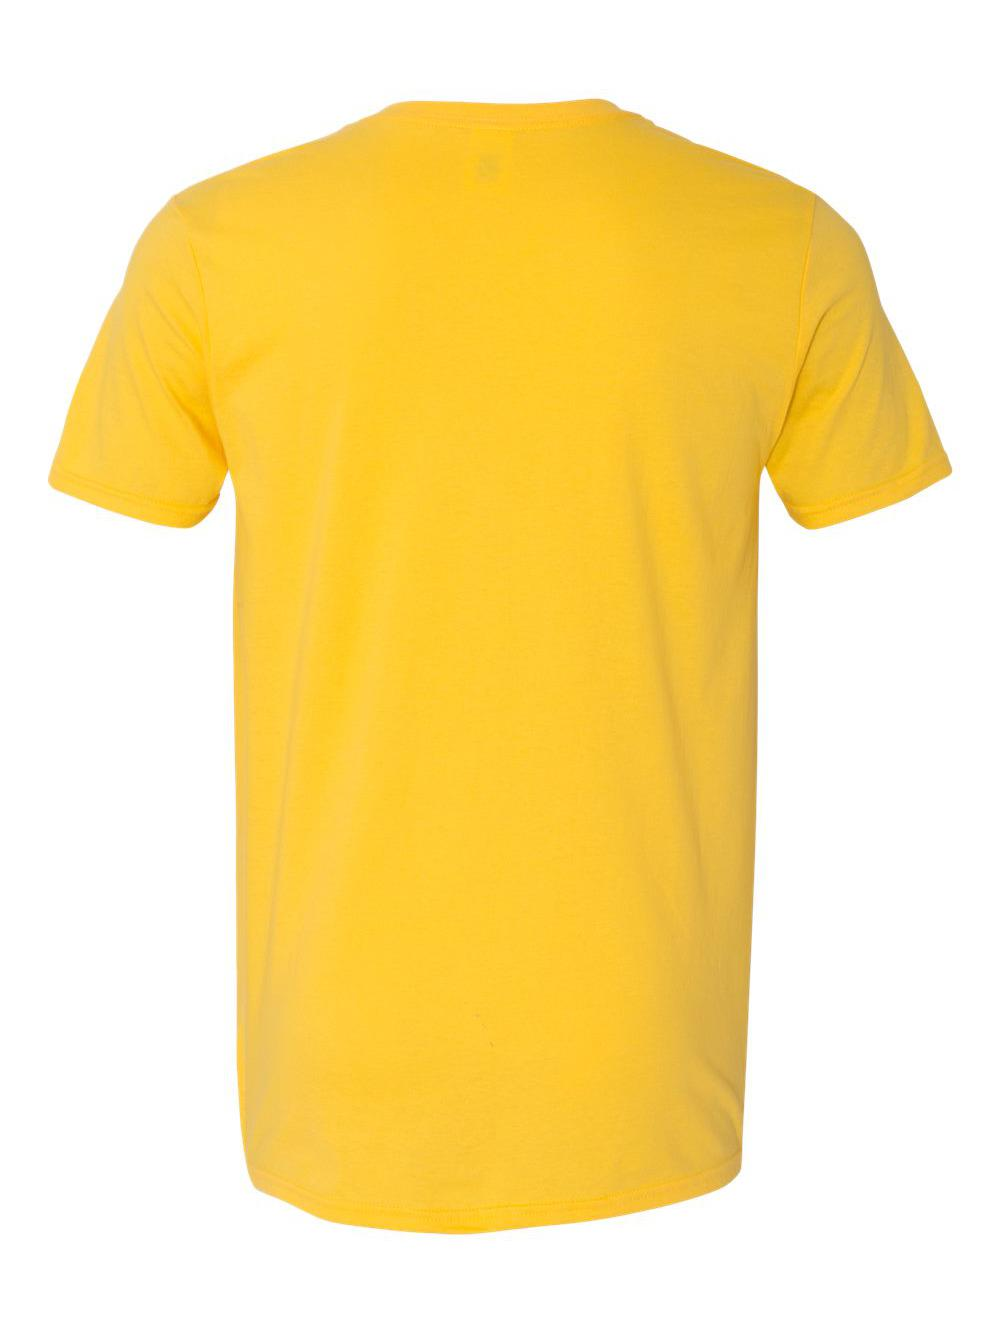 Gildan-Softstyle-T-Shirt-64000 thumbnail 43